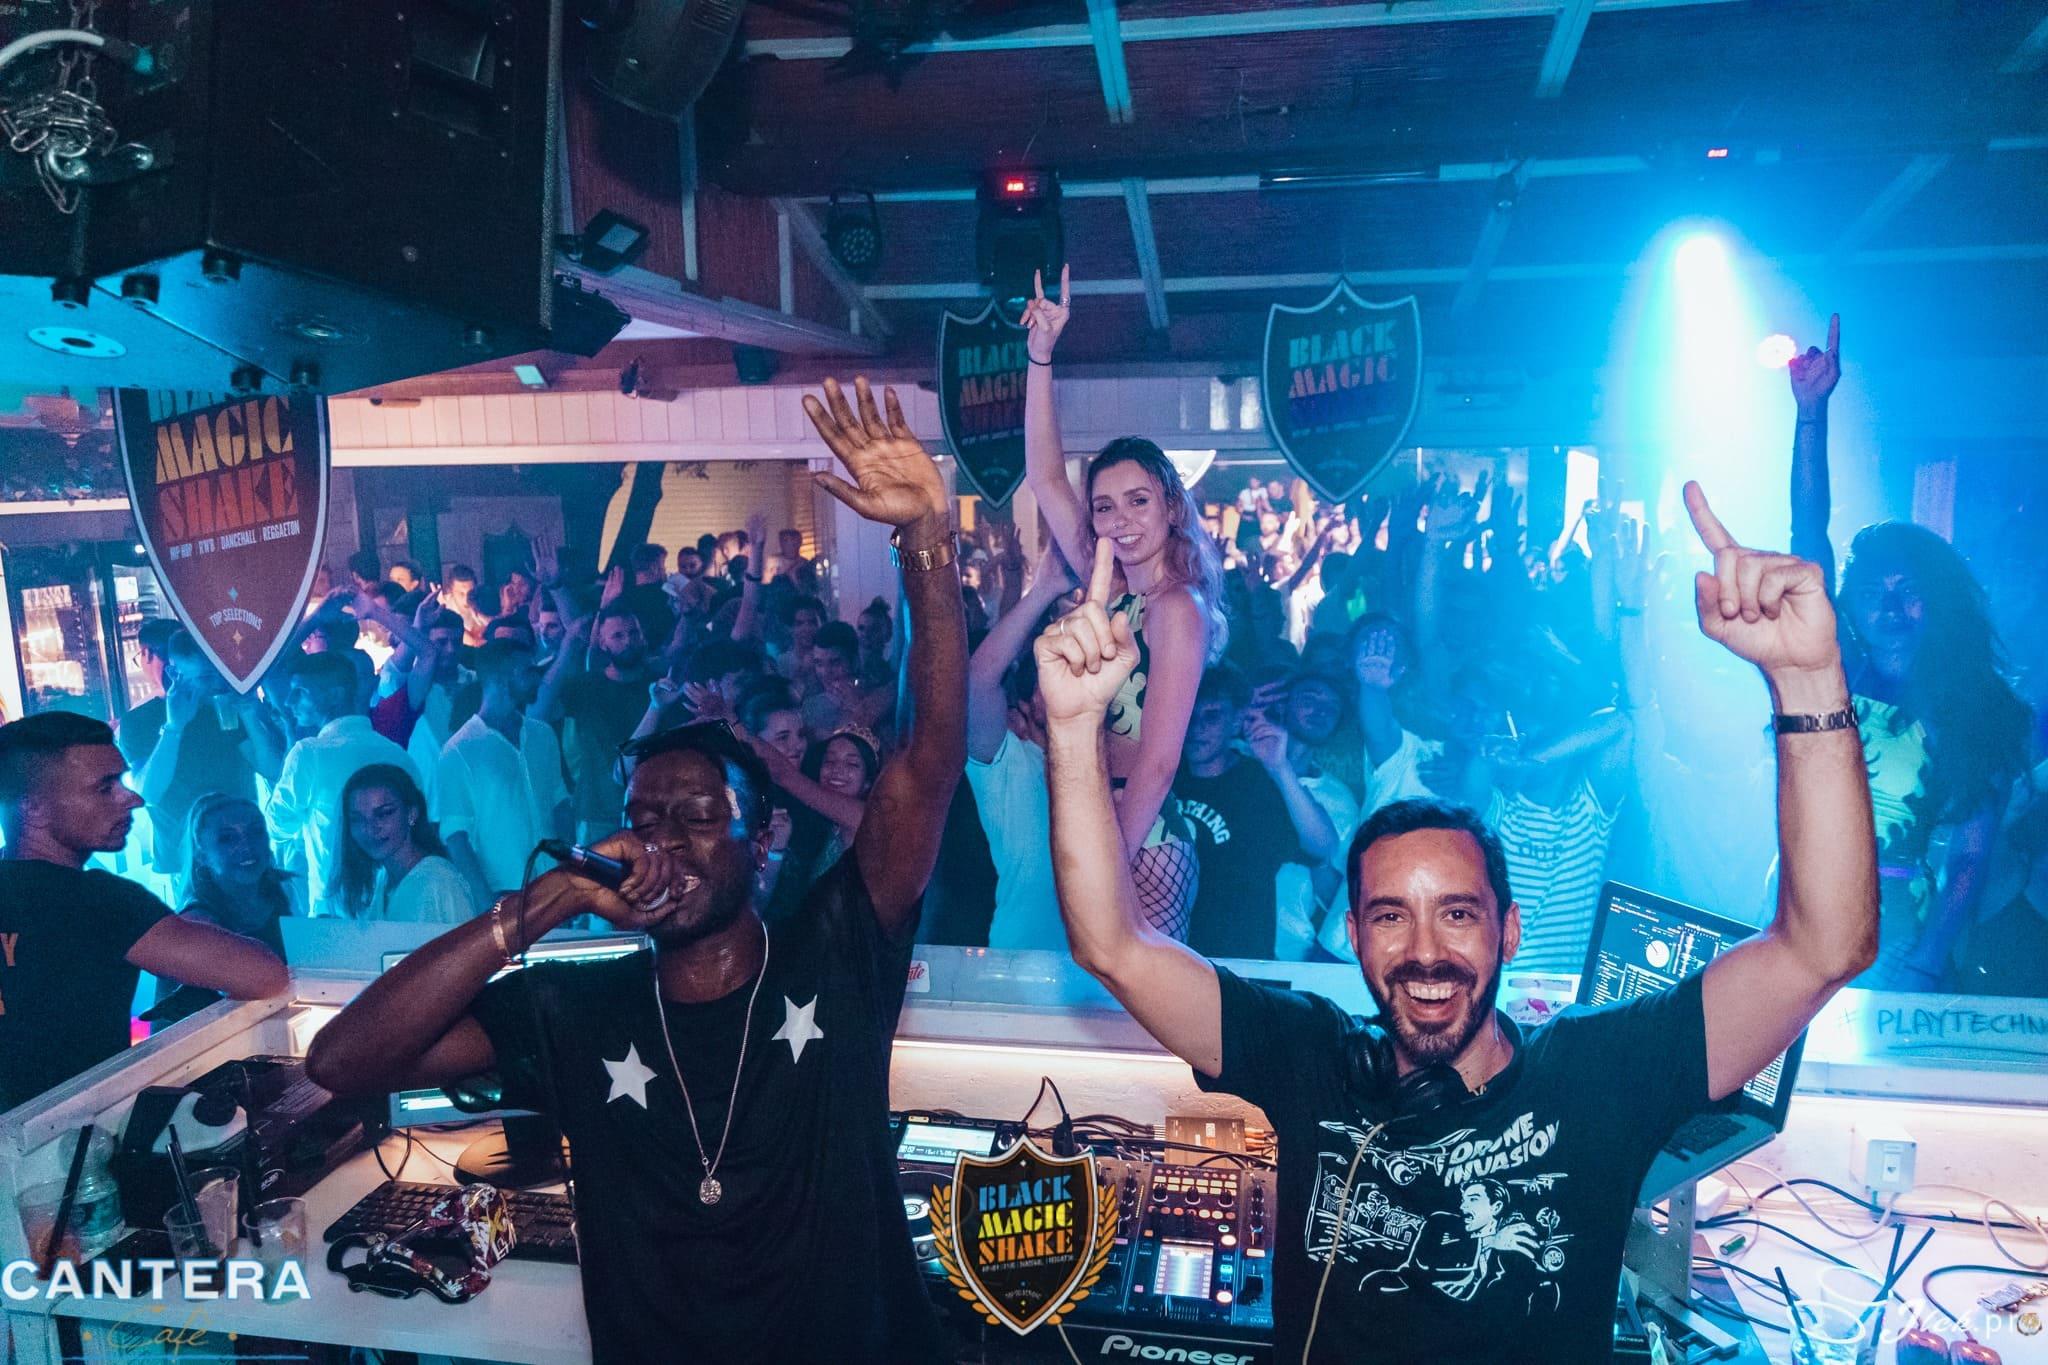 Immagine per Niente più musica al Cantera, la celebre discoteca di Sistiana chiuderà per sempre